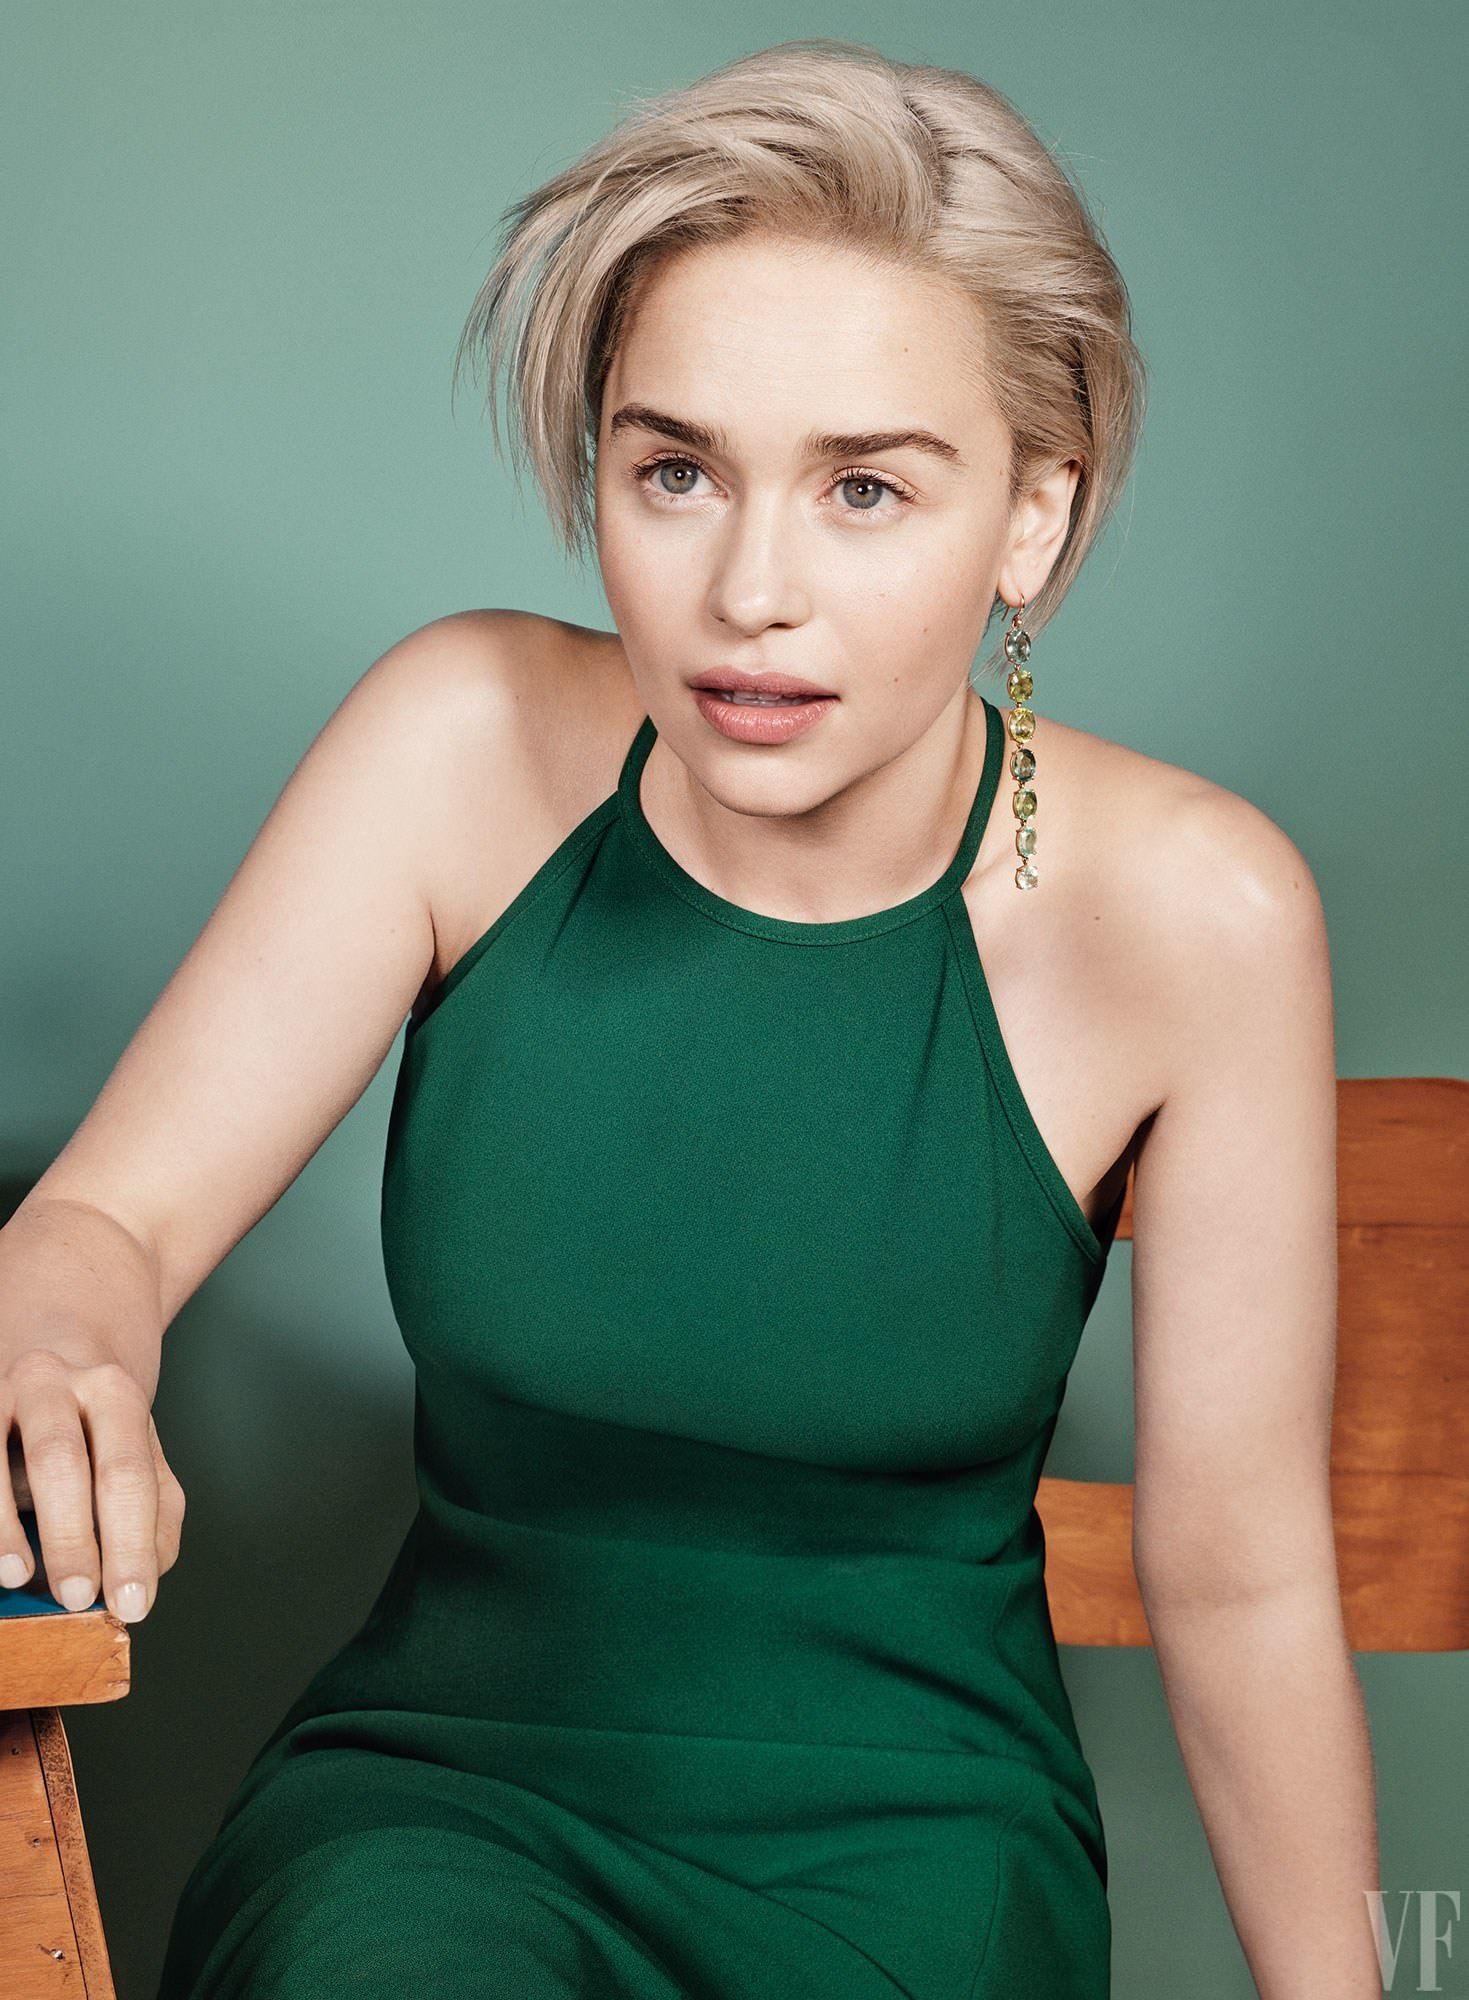 Emilia Clarke Full HD Wallpapers | Emilia clarke hair ...